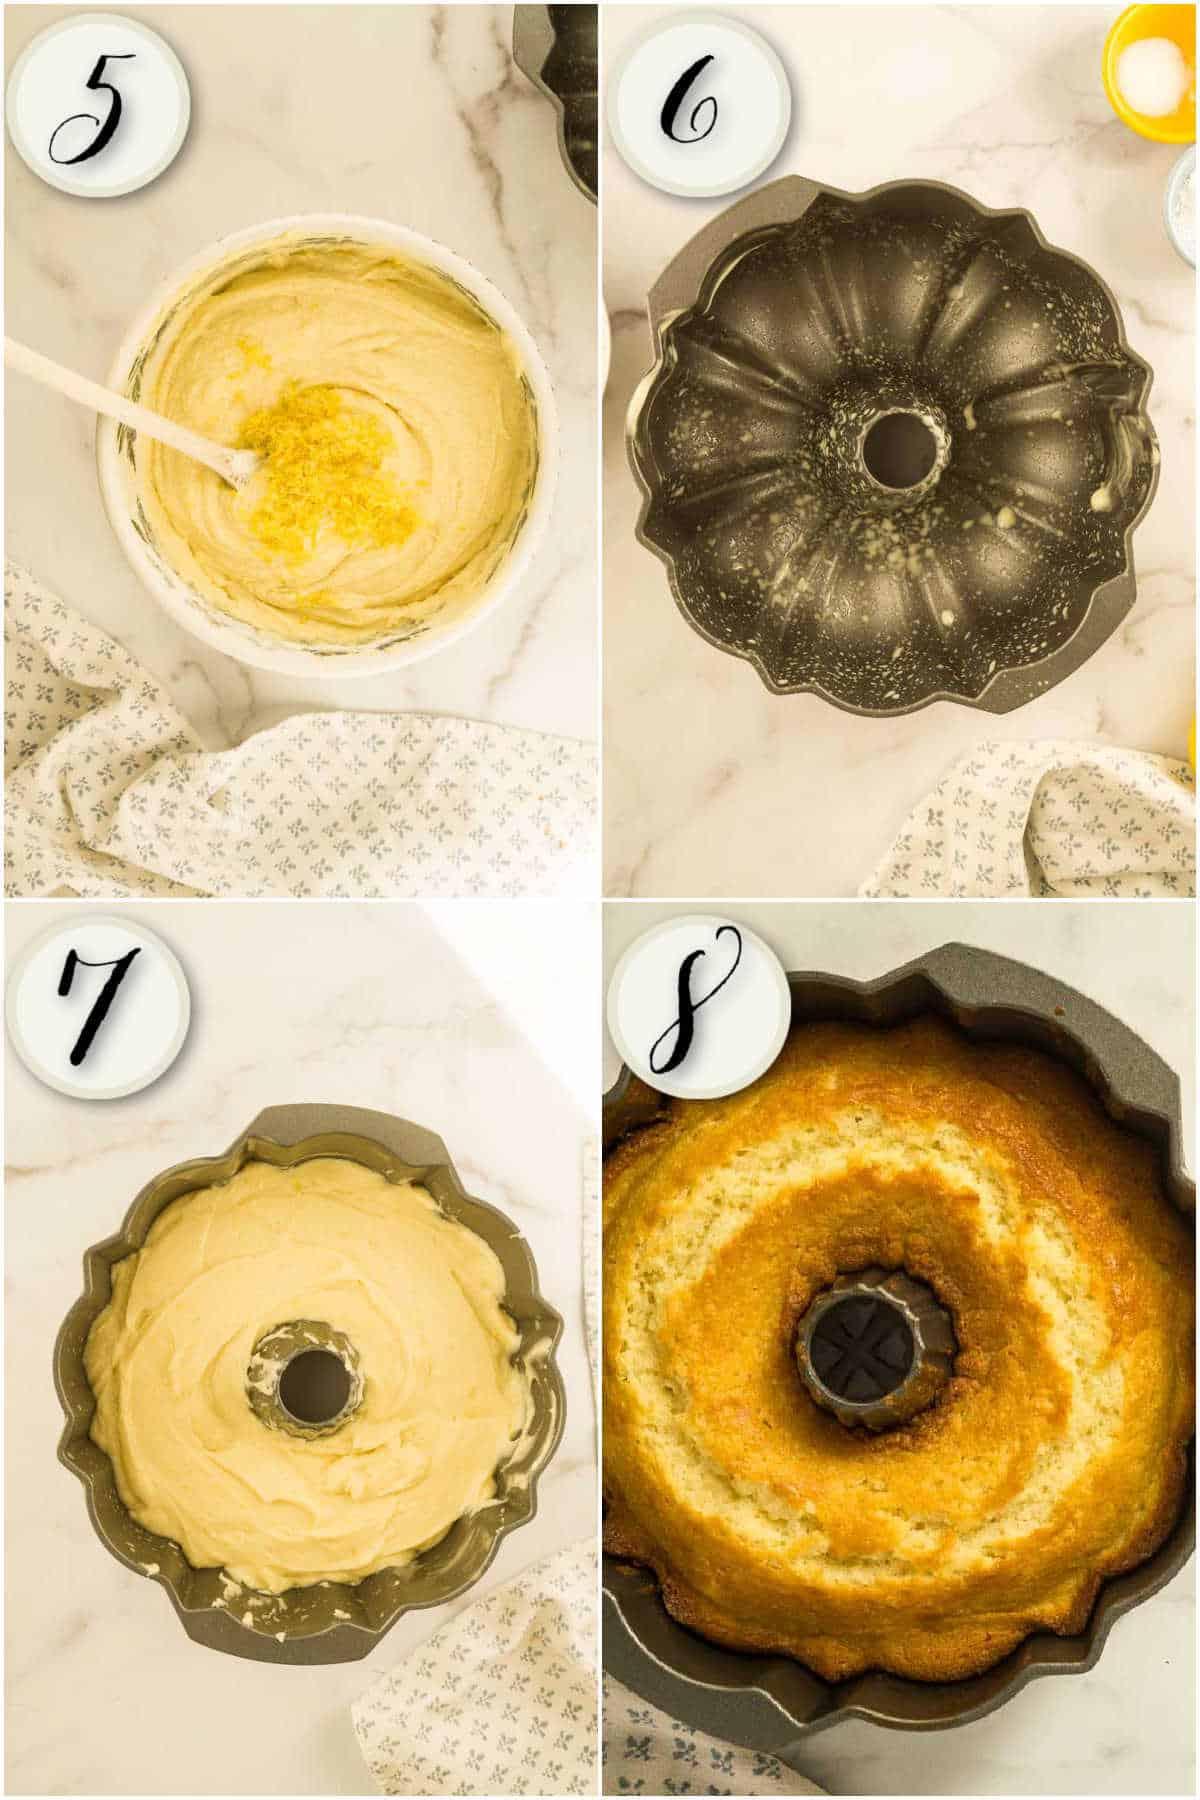 adding lemon zest, preparing bundt pan, smoothing cake batter, baked cake